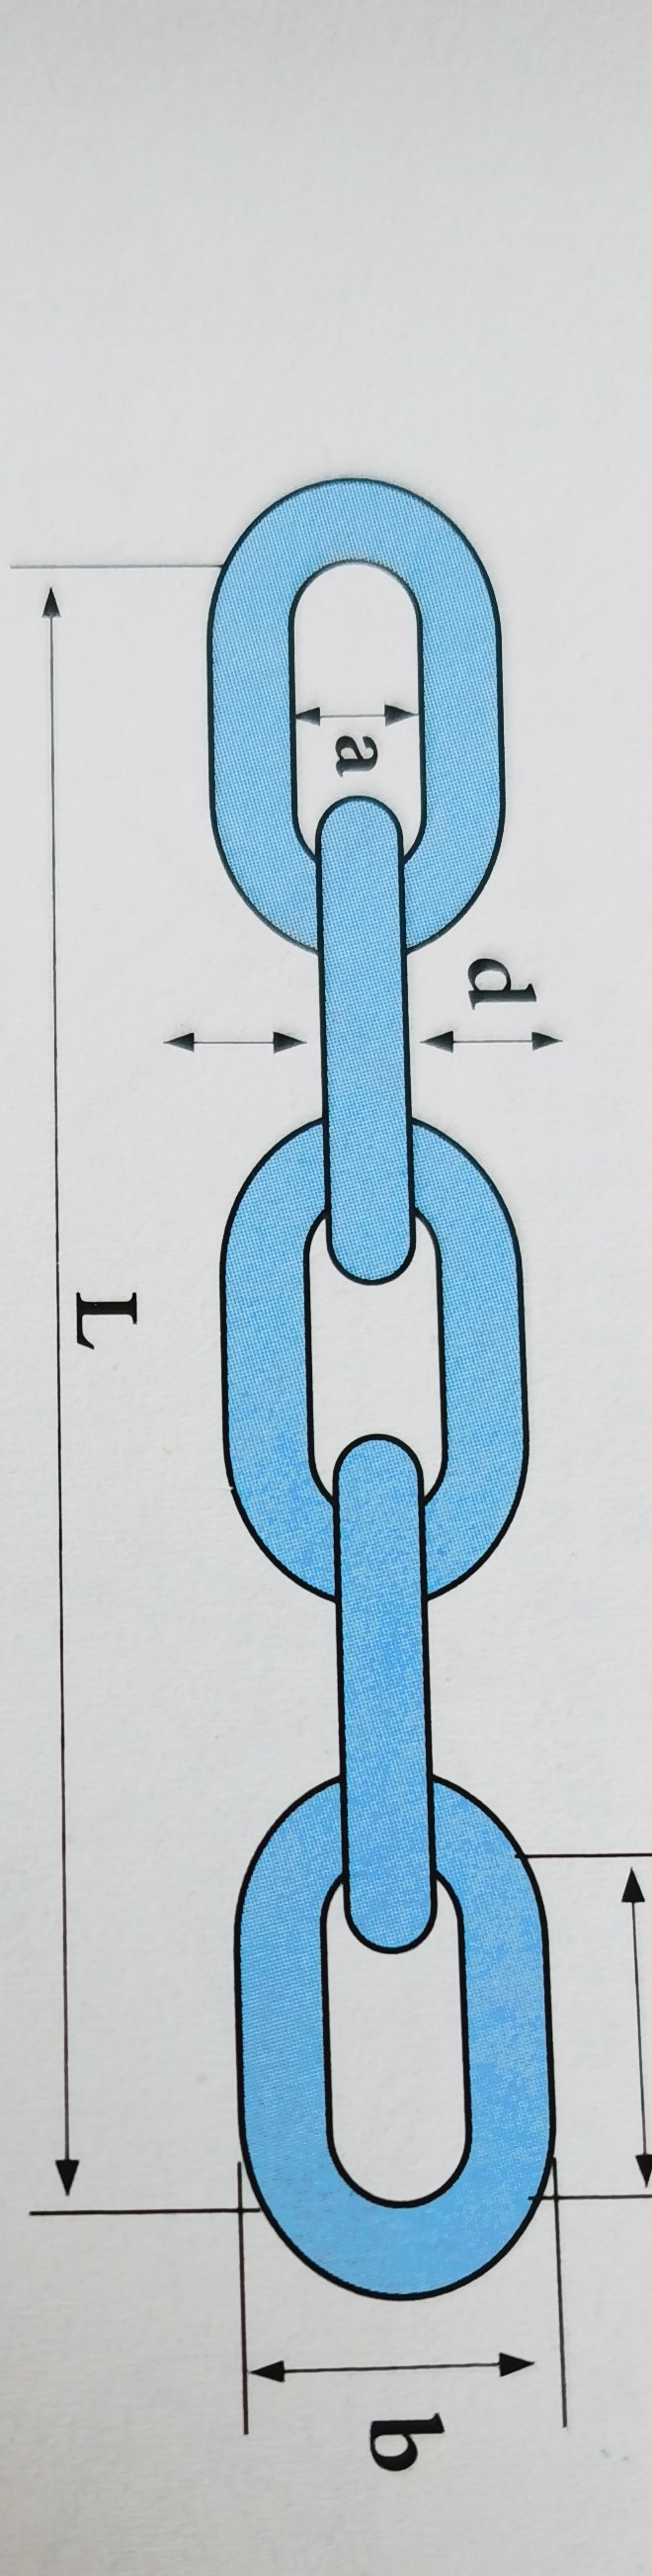 起重用短环链dn20 起重用短环链dn20